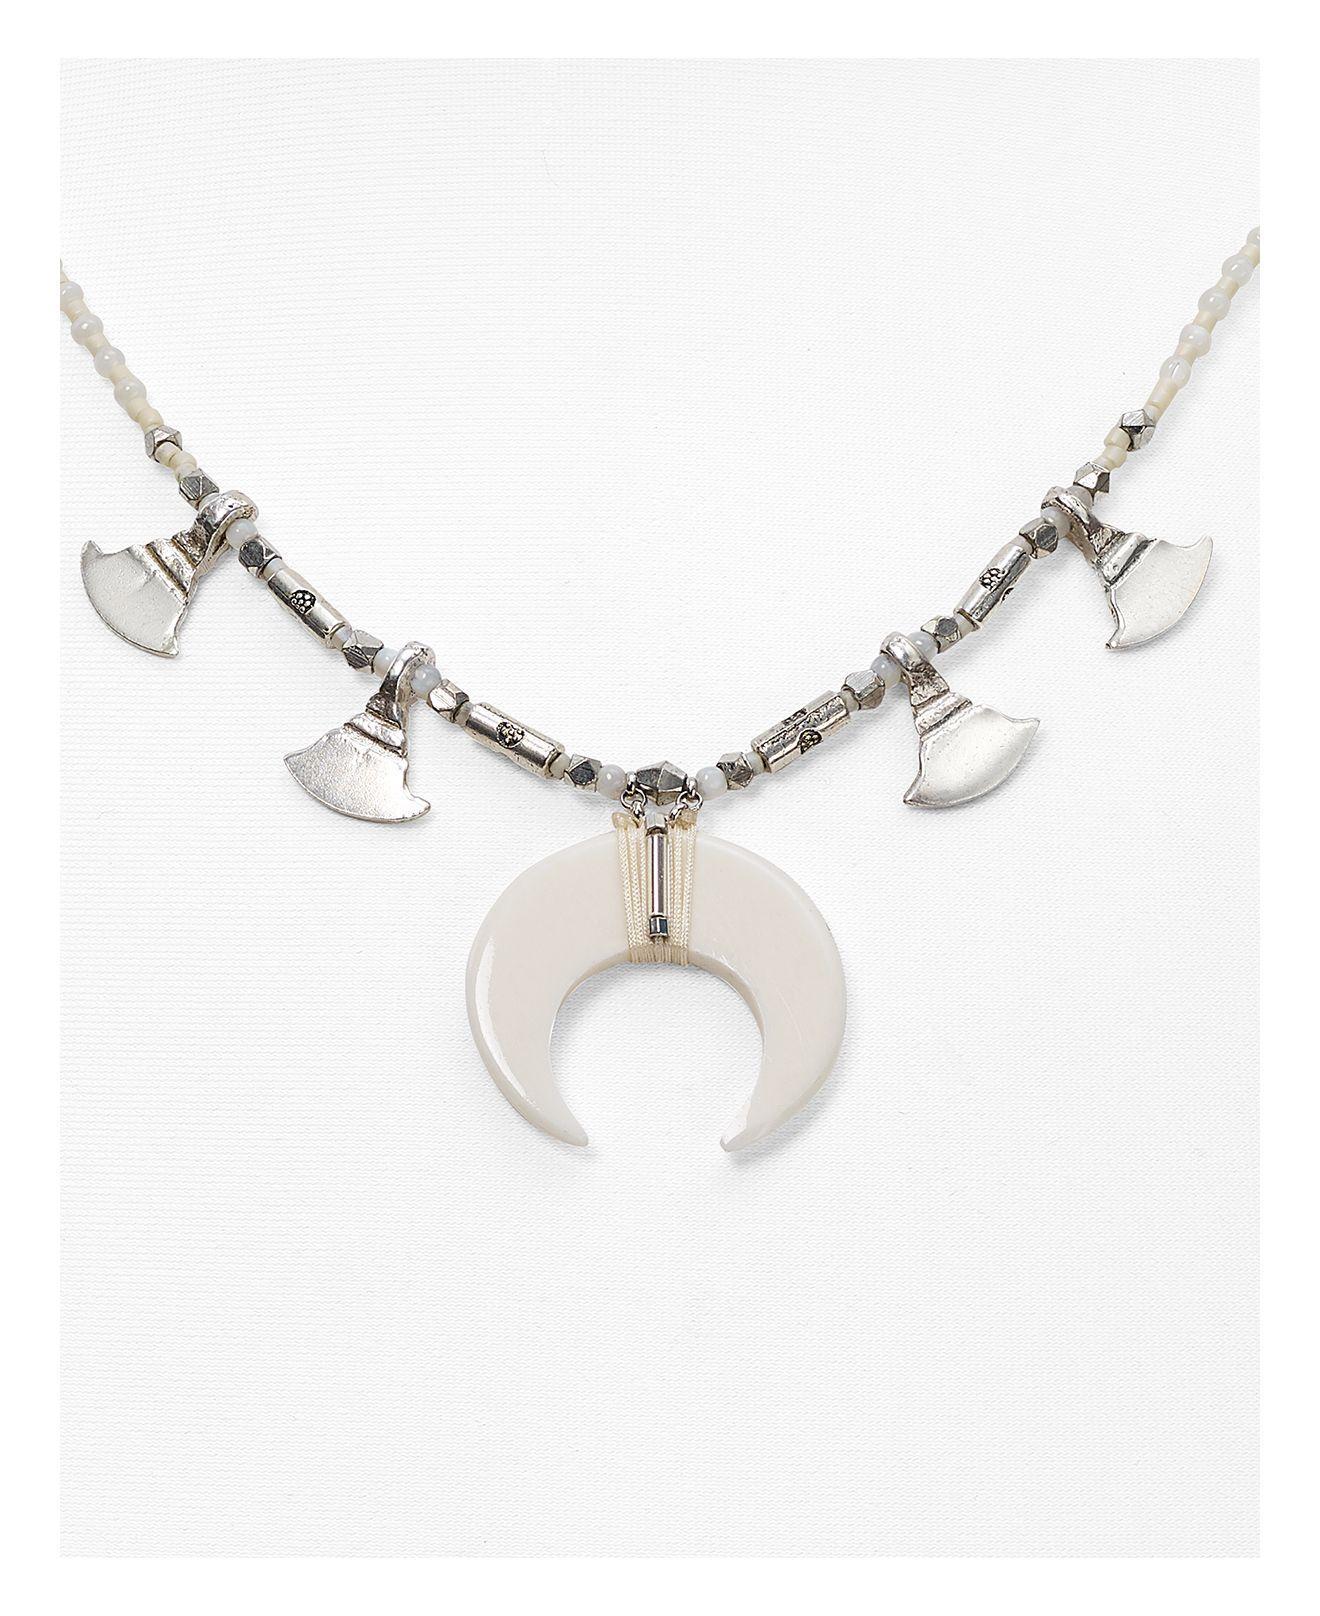 "Chan Luu Crescent Pendant Necklace, 16"" in White"